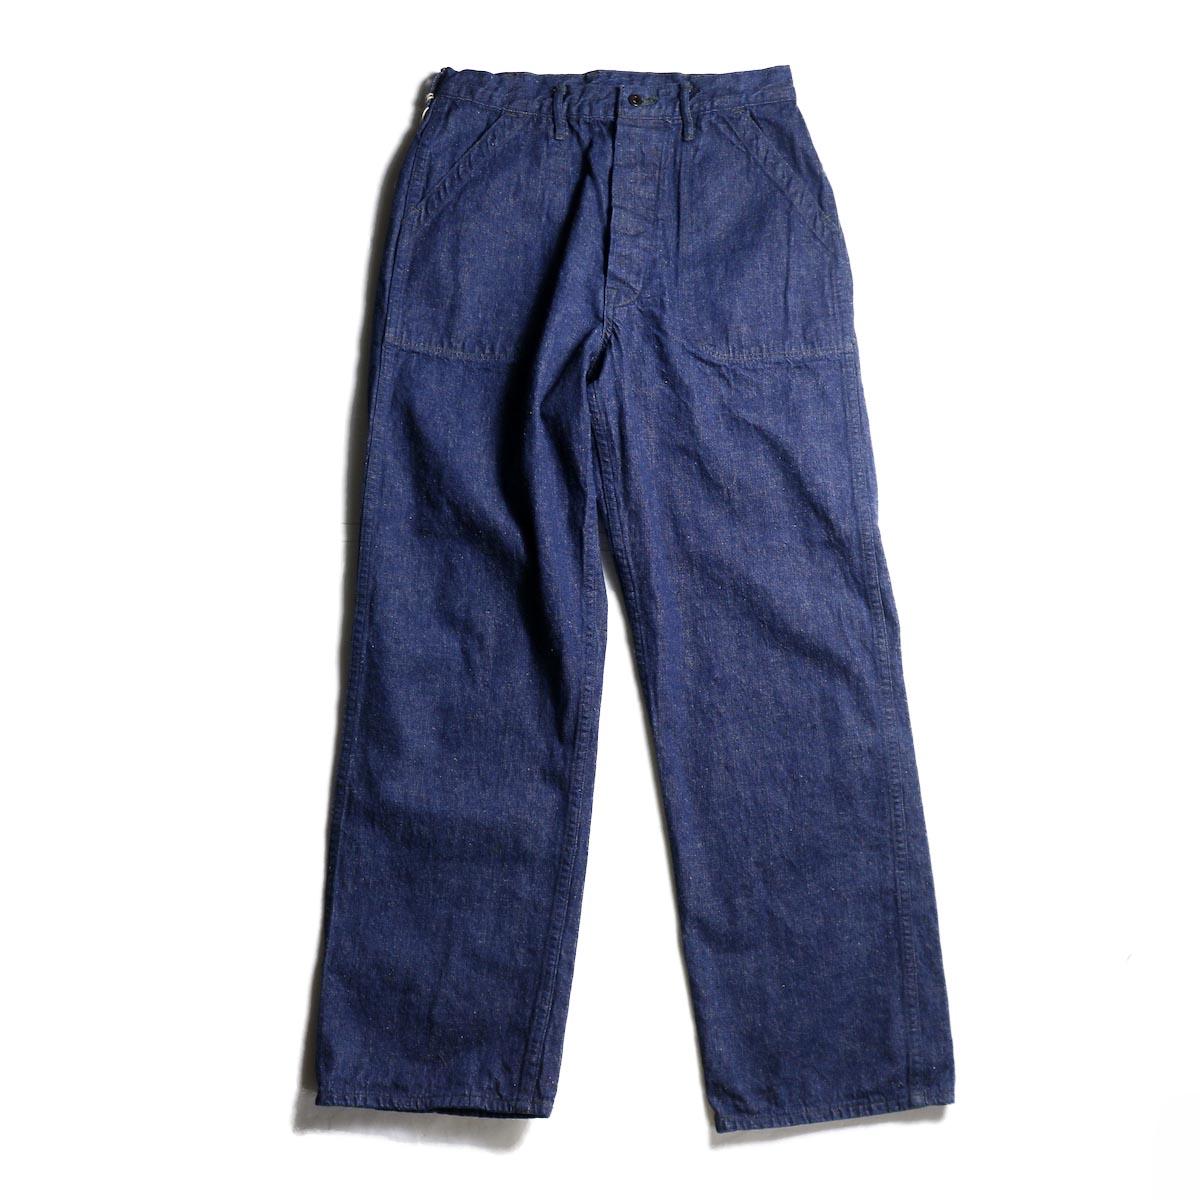 orSlow / US NAVY UTILITY PANTS (ONE WASH)